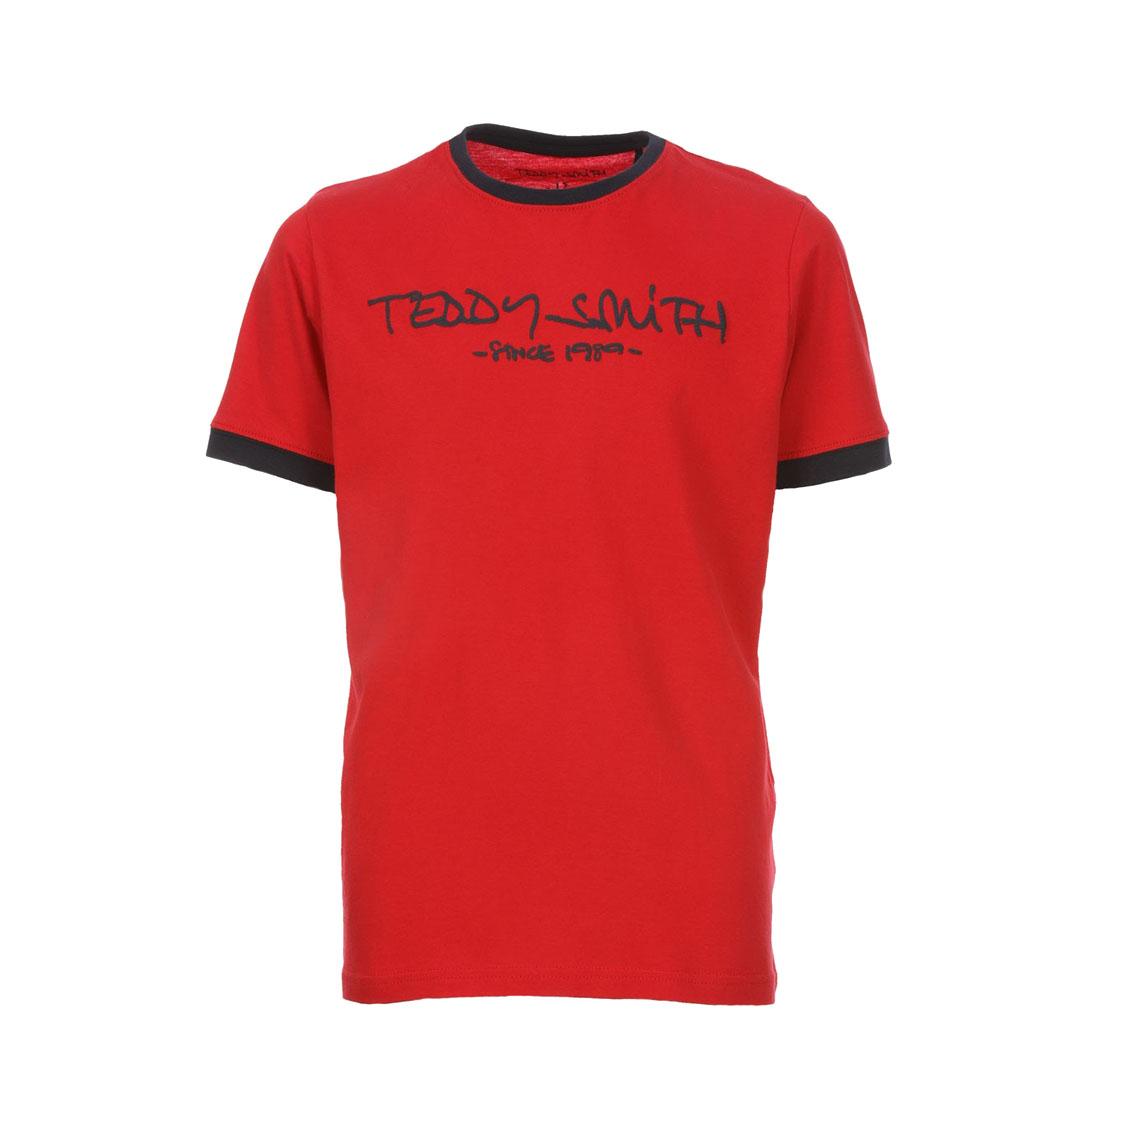 Tee-shirt col rond  ticlass en coton rouge floqué en bleu marine